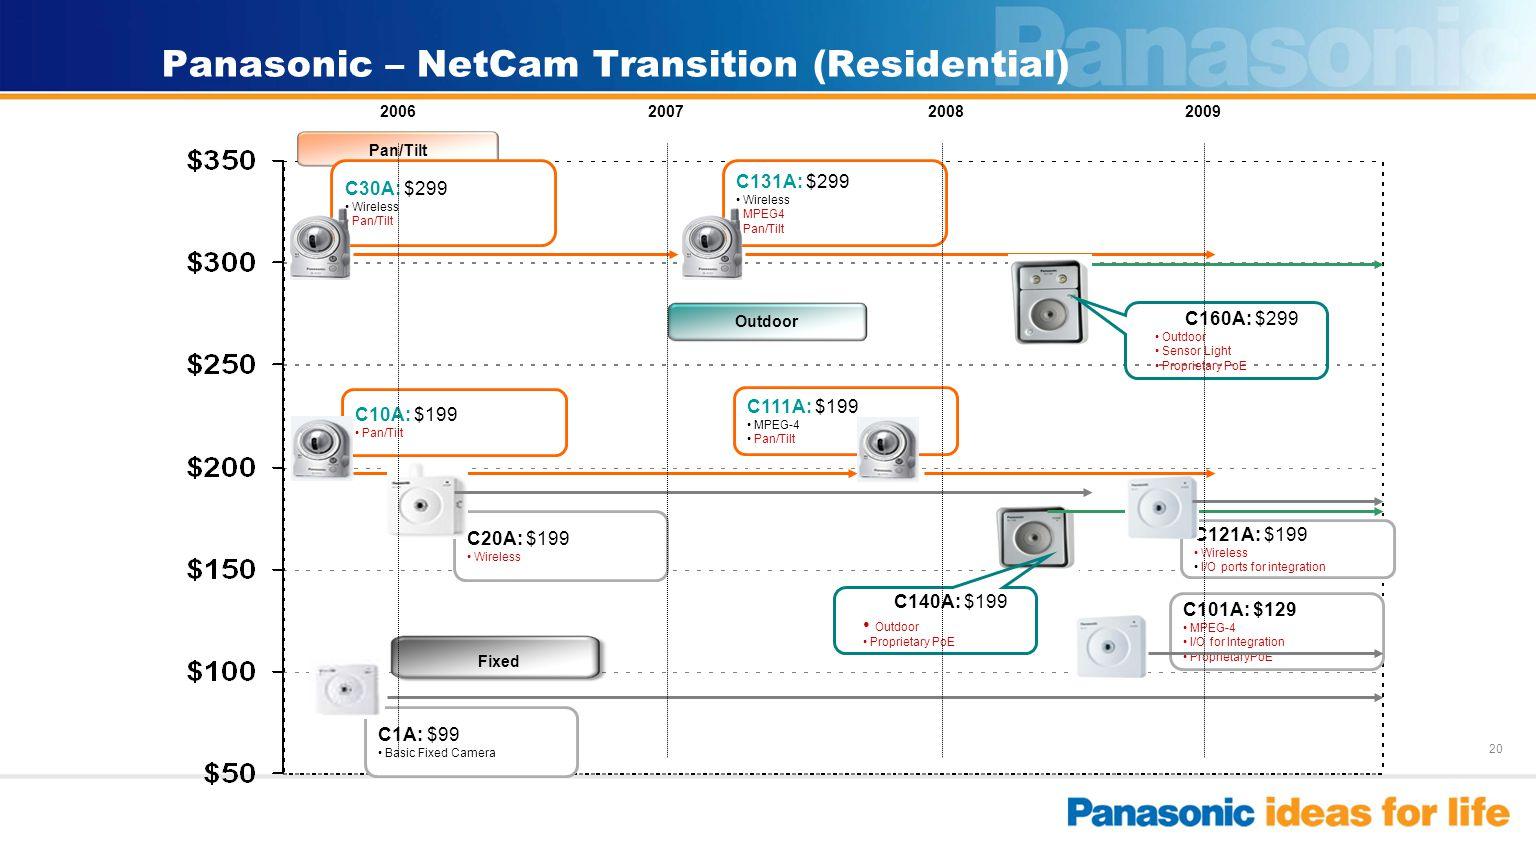 20 Panasonic – NetCam Transition (Residential) Pan/Tilt C131A: $299 Wireless MPEG4 Pan/Tilt C30A: $299 Wireless Pan/Tilt C111A: $199 MPEG-4 Pan/Tilt C